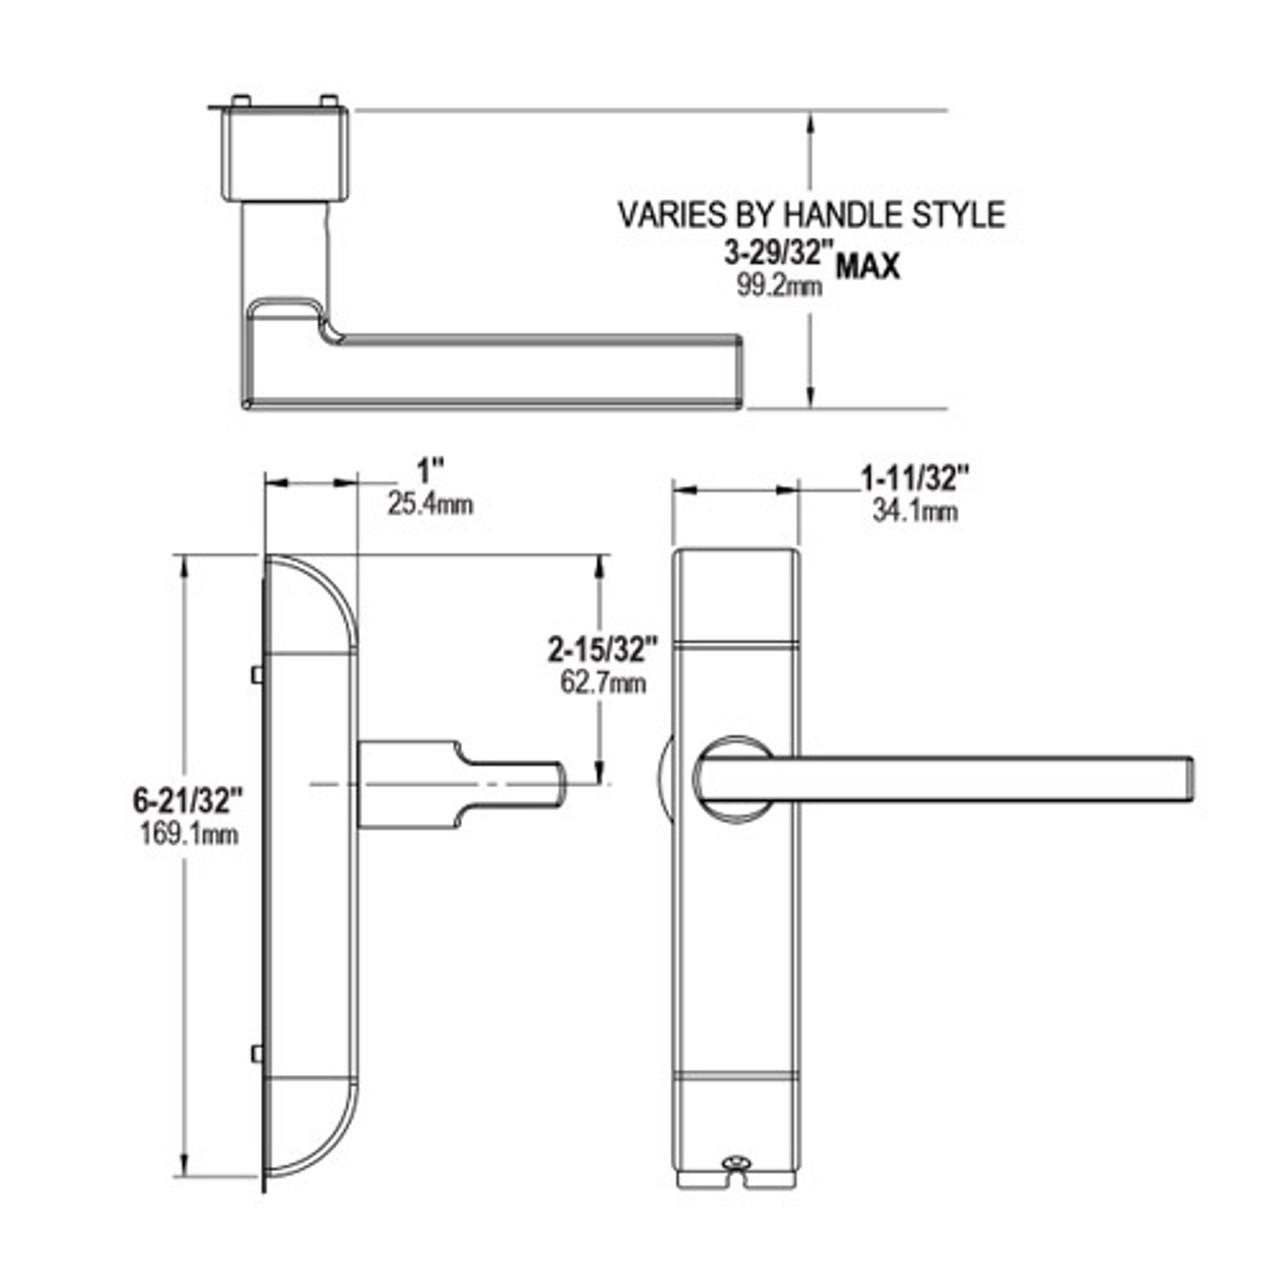 4600M-MV-652-US4 Adams Rite MV Designer handle Dimensional View